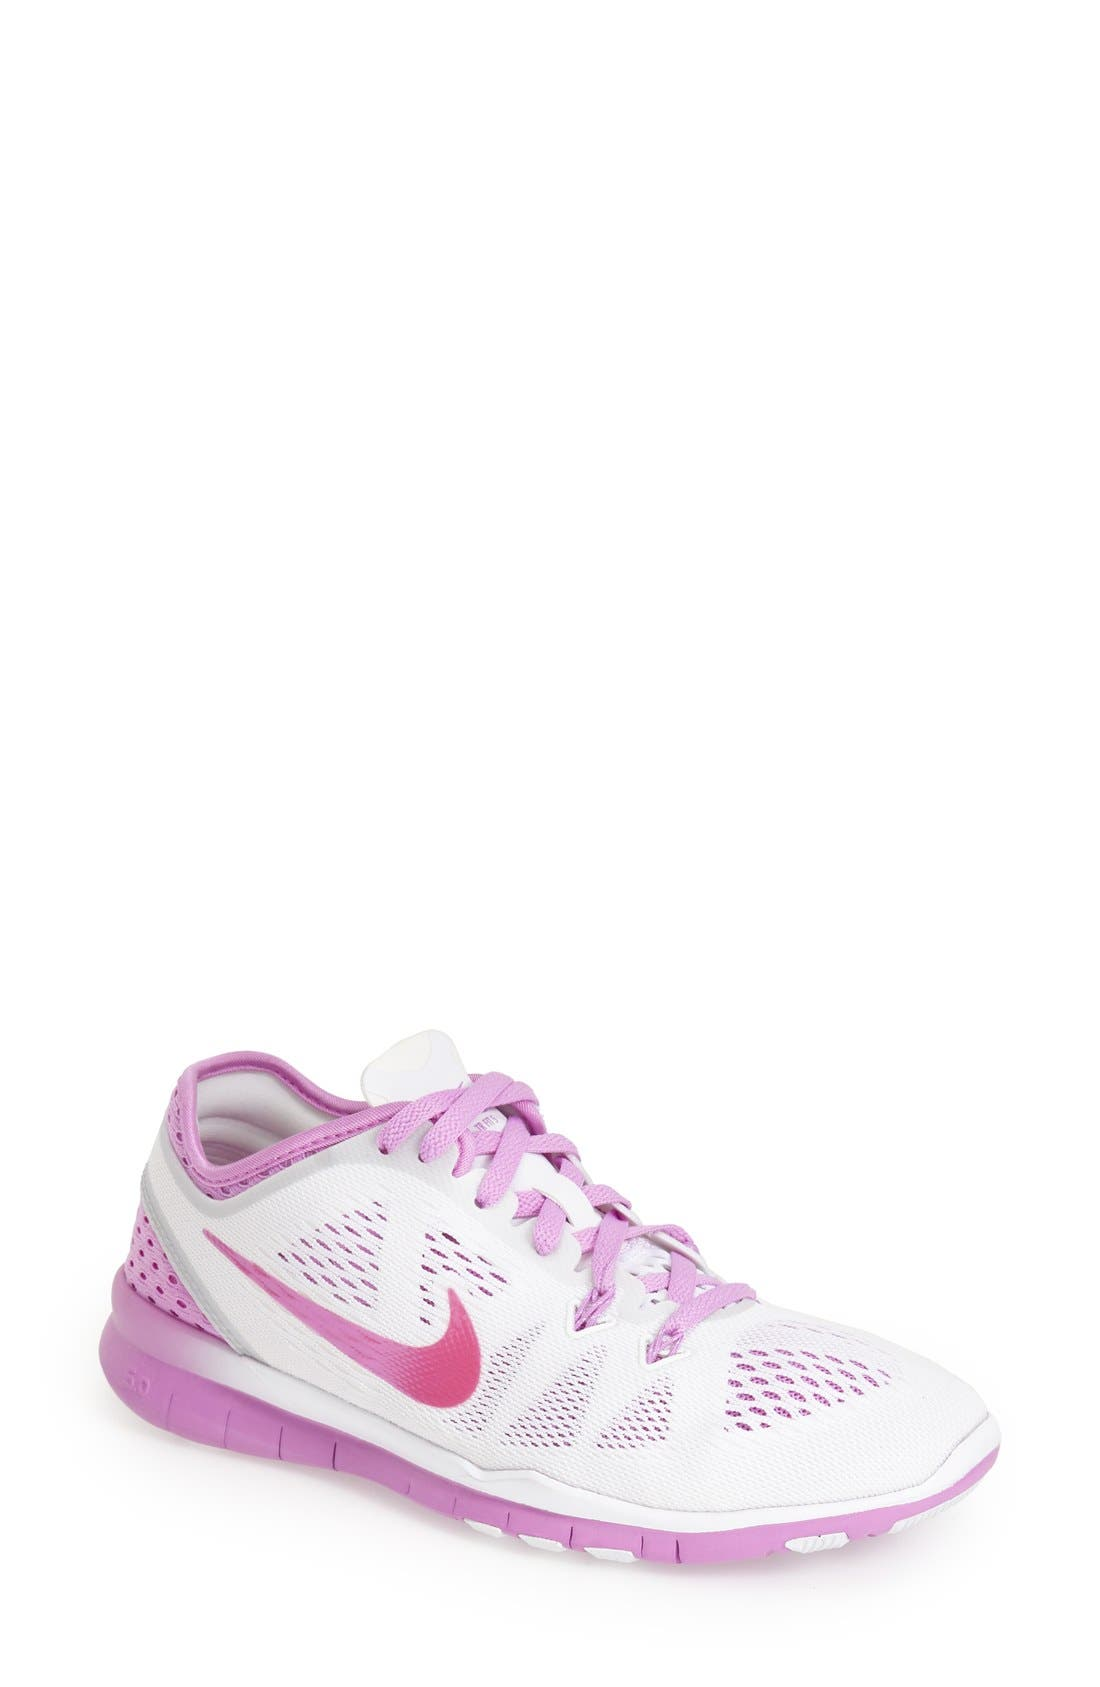 Alternate Image 1 Selected - Nike 'Free 5.0 TR Fit 5 Breathe' Training Shoe (Women)